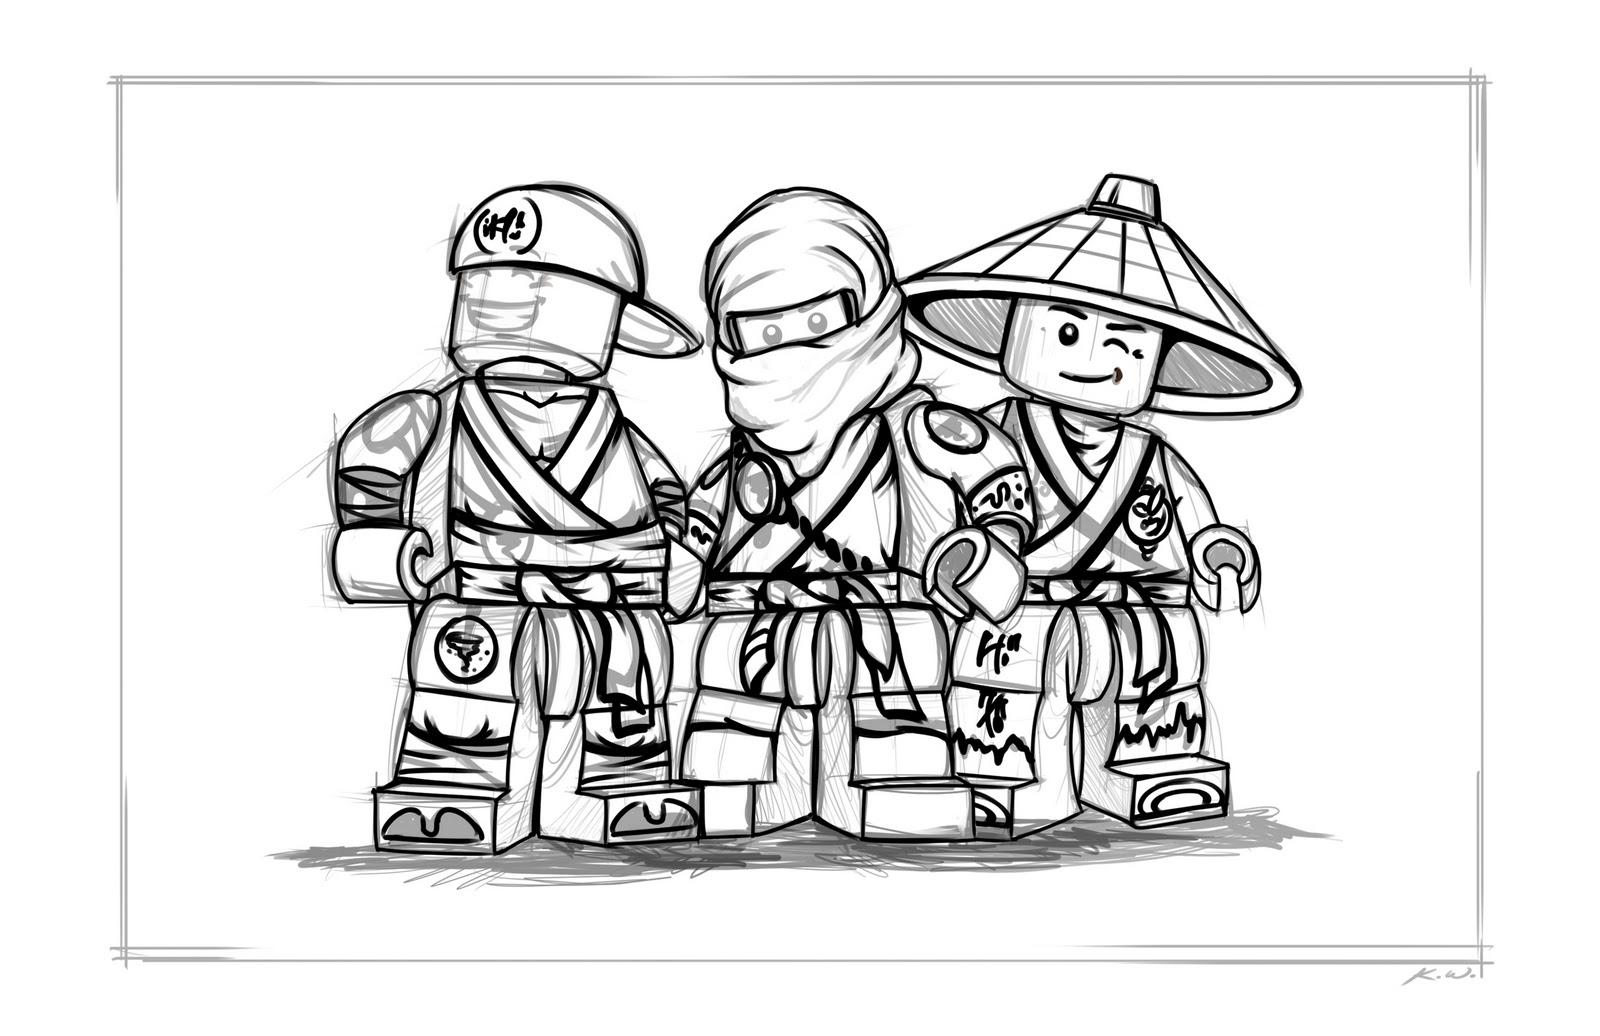 Lego-Ninjago-Coloring-Pages